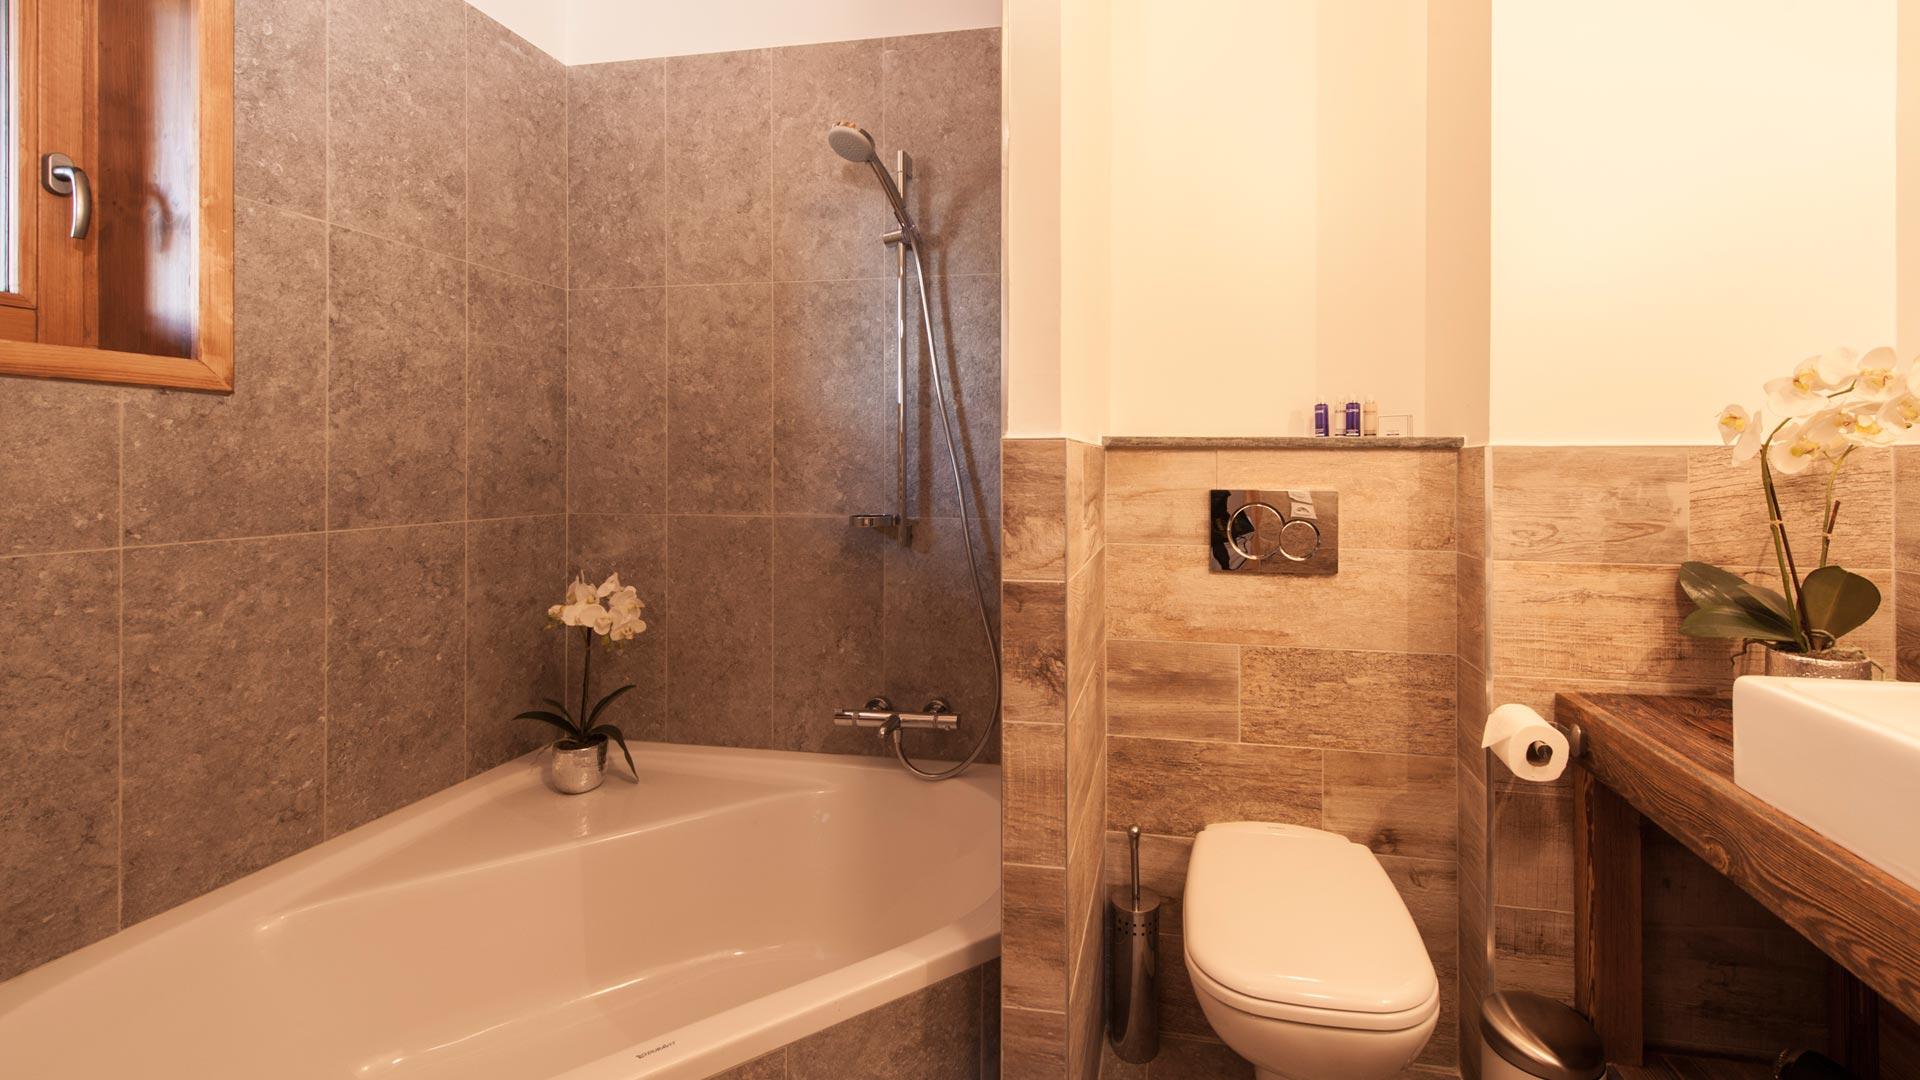 Bedroom 1 Bathroom - Haut Brion Luxury Self Catered Chalet in Sainte Foy